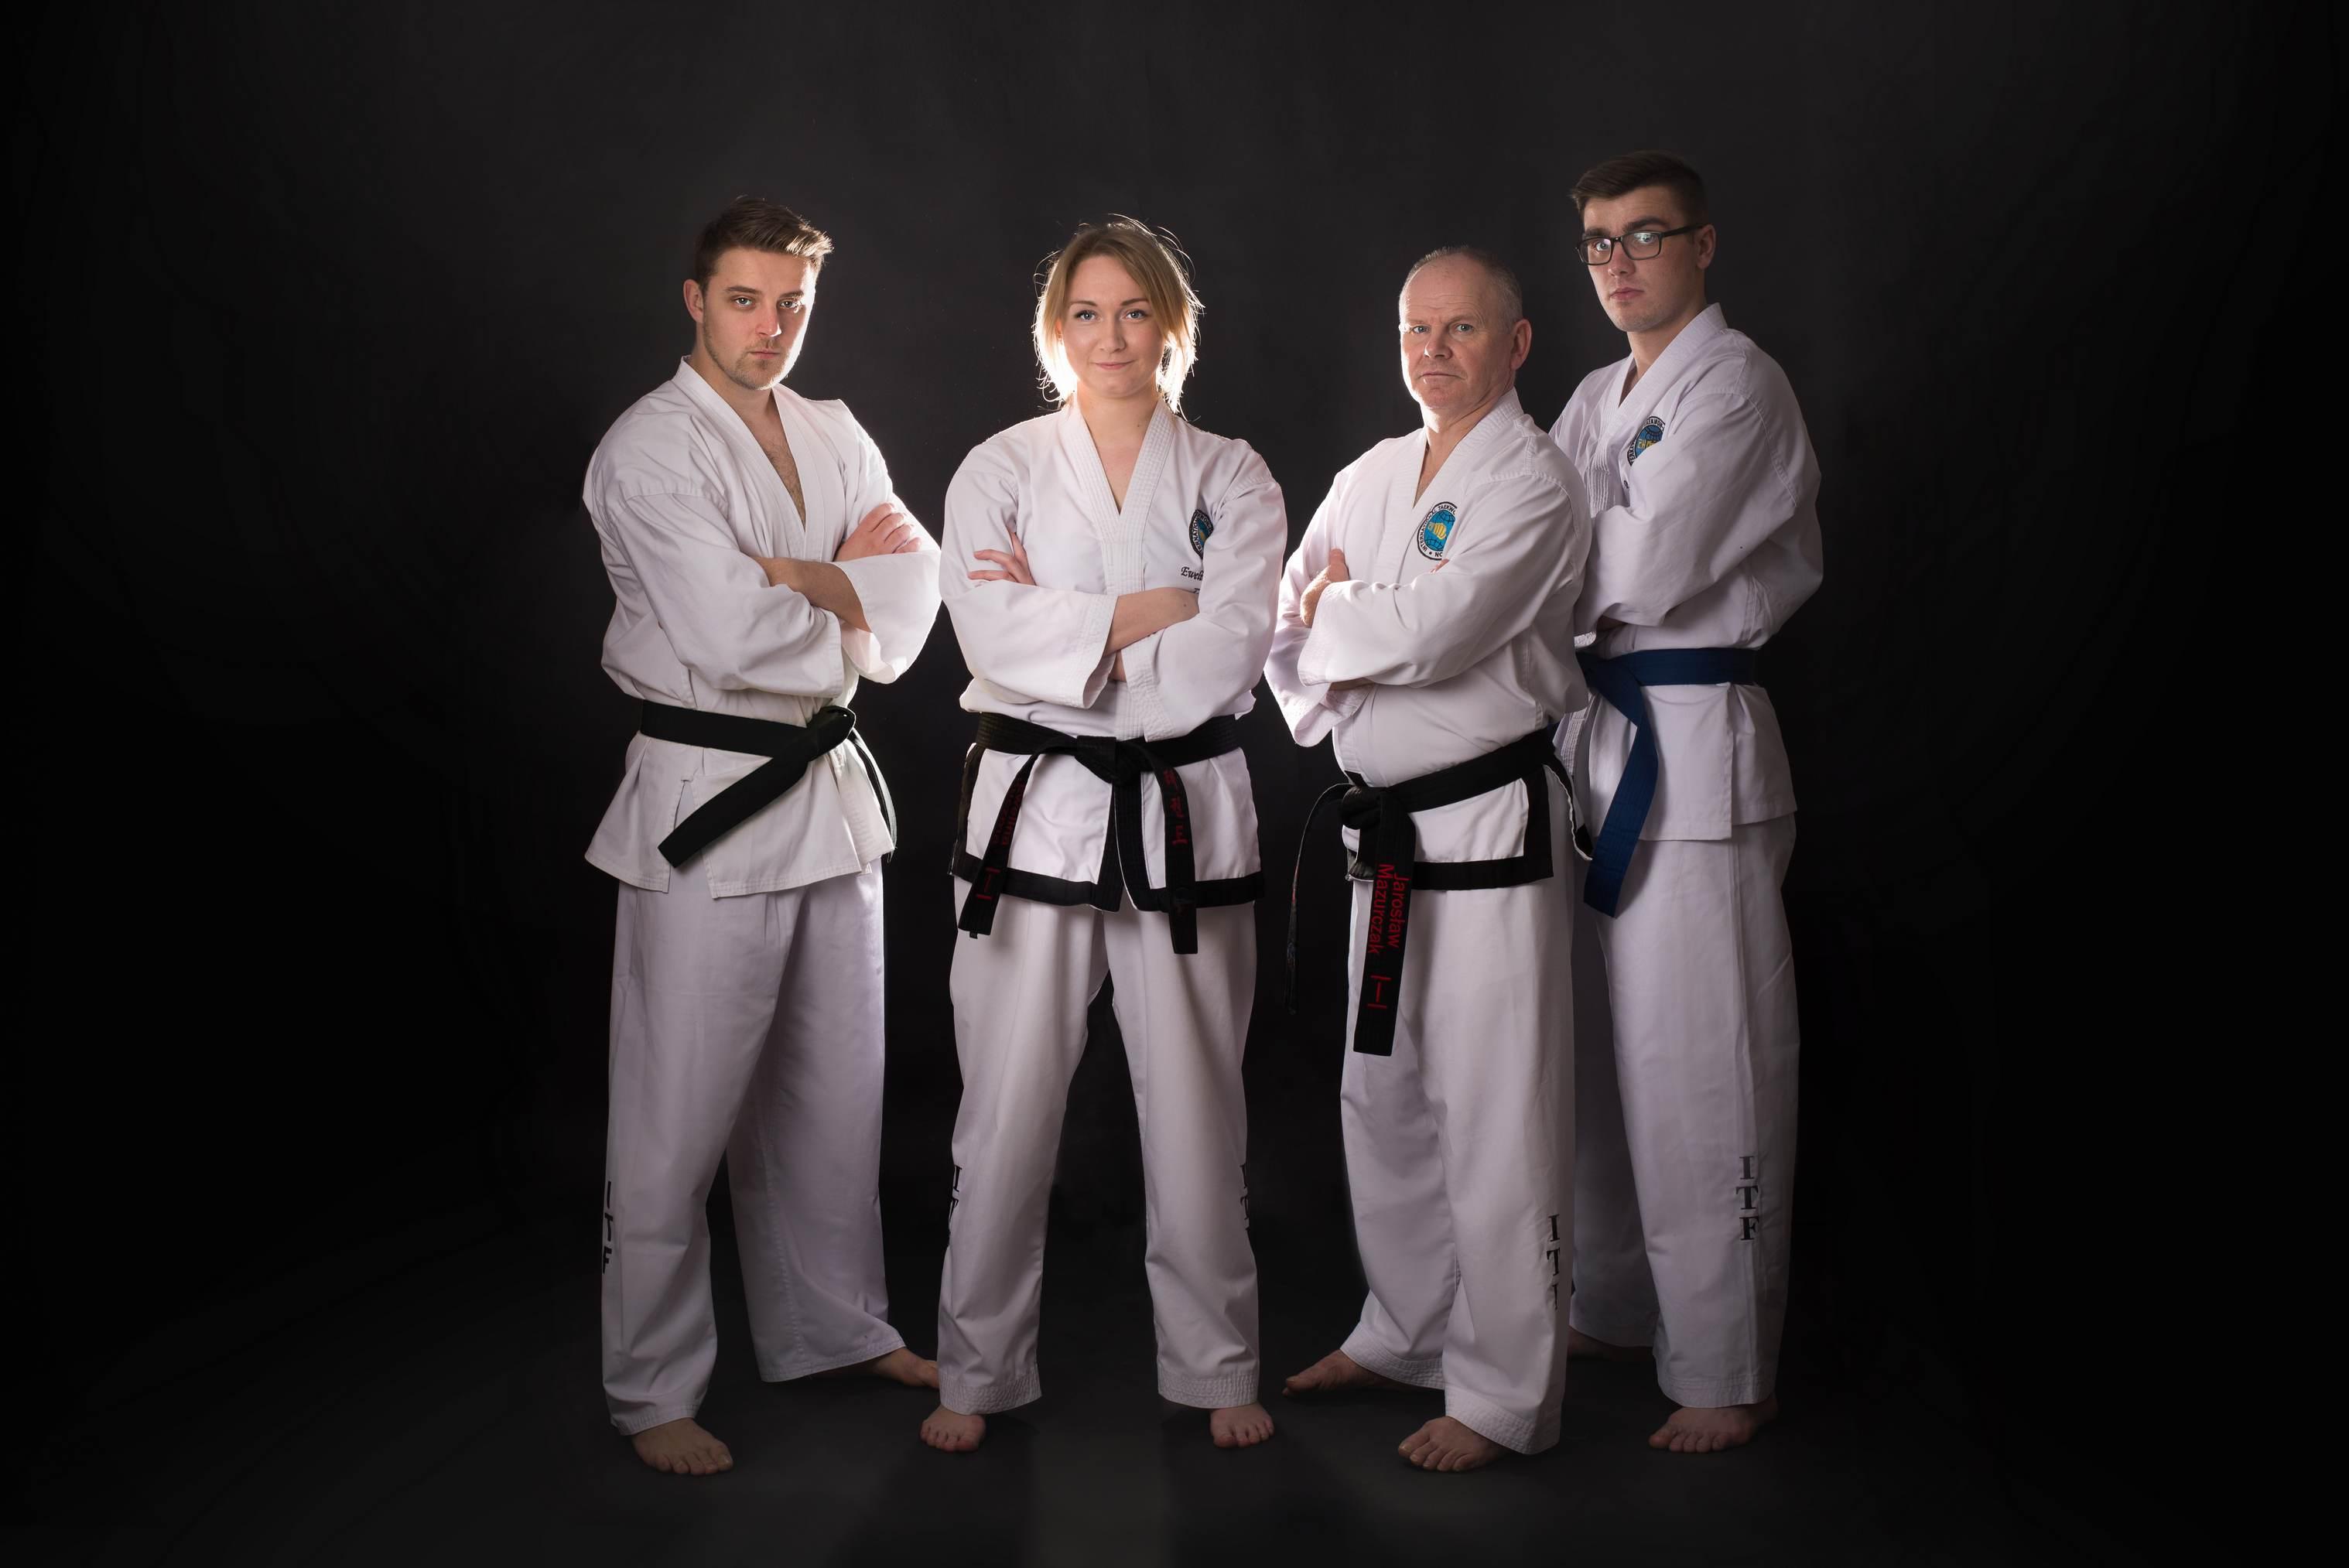 Instruktorzy taekwon-do